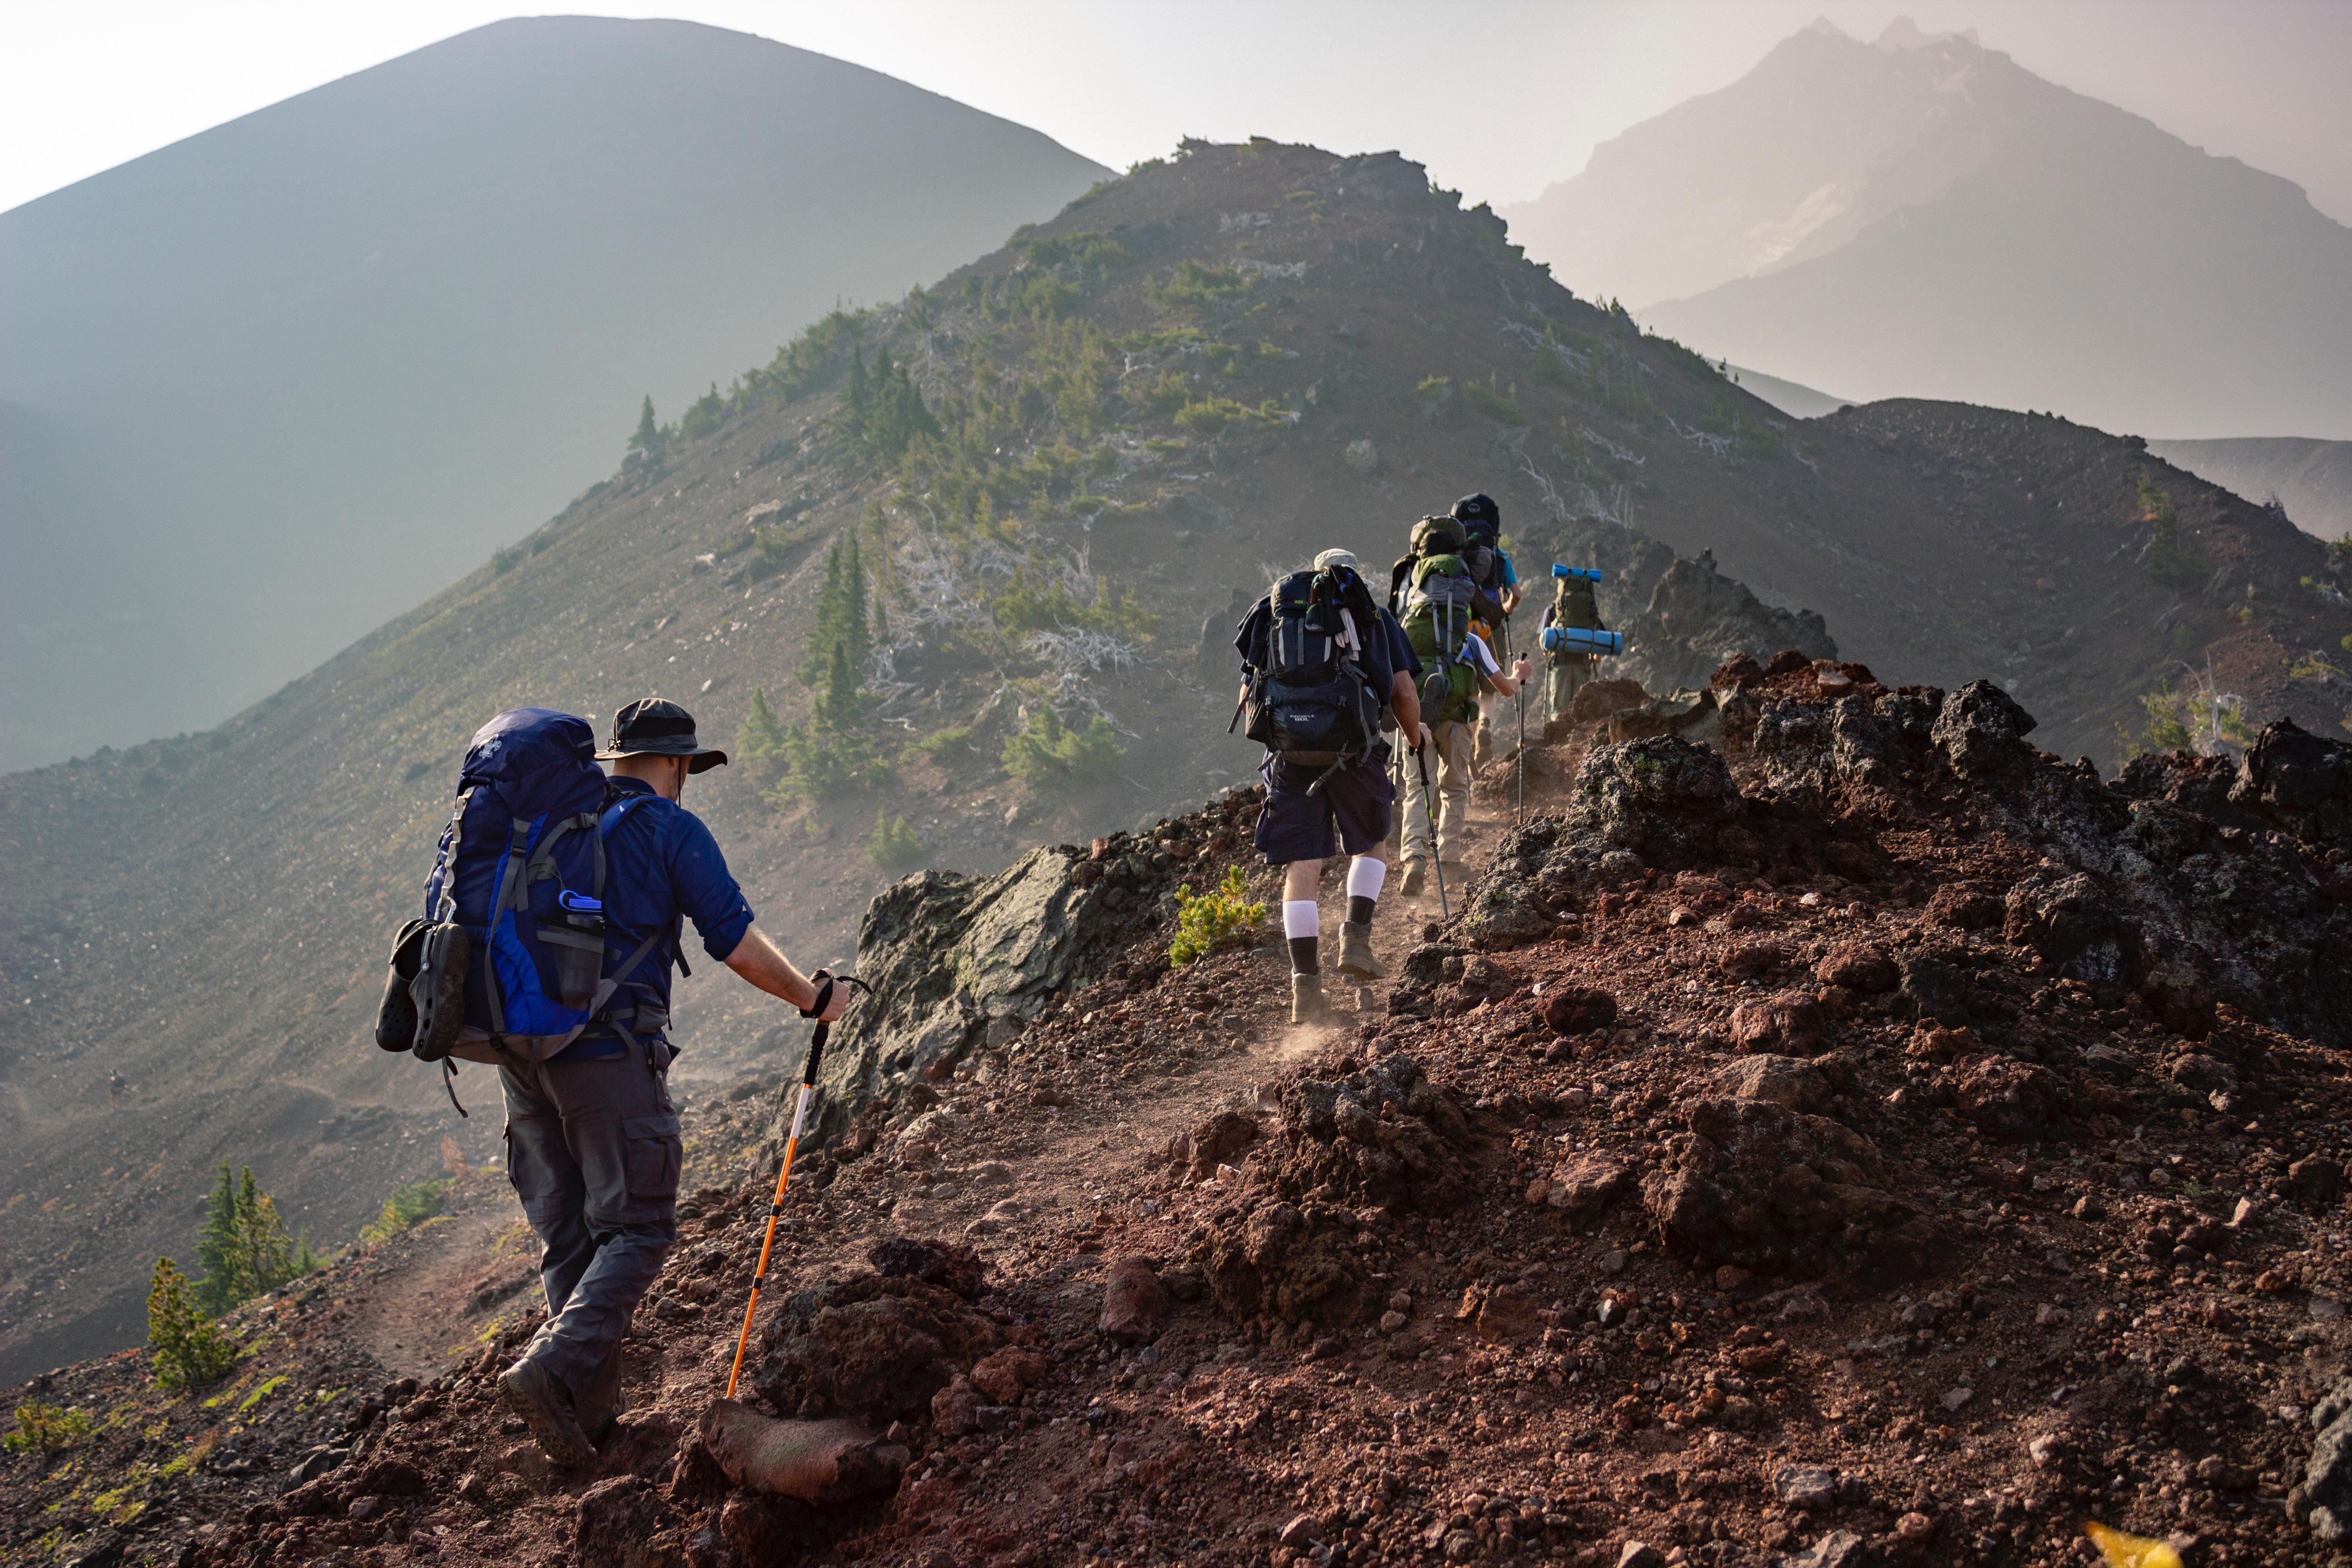 adventure-backpacker-climb-1365425.jpg